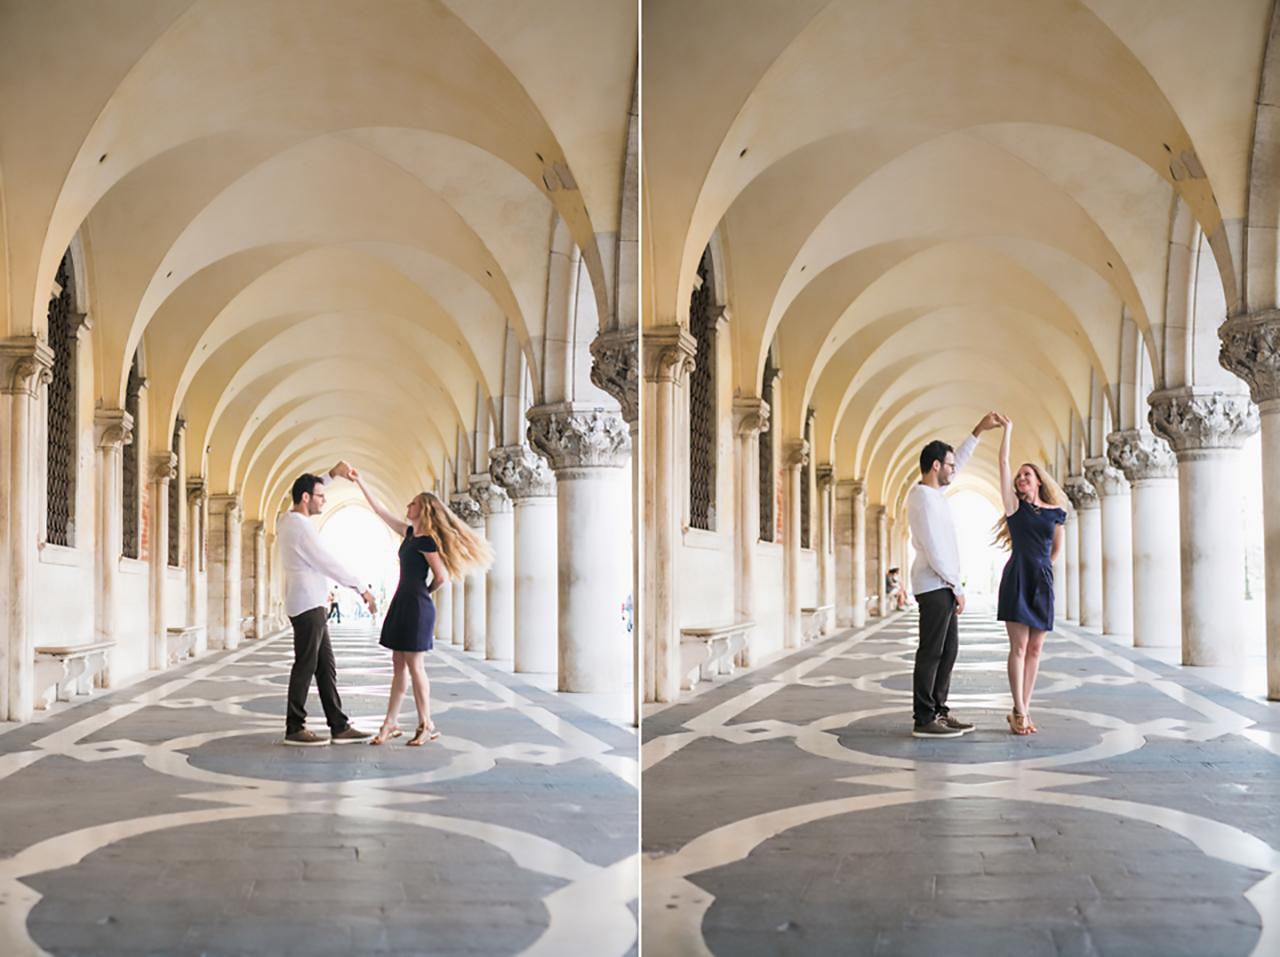 Matrimonio Lago Toscana : Berni photography fotografo matrimonio italia fotografo